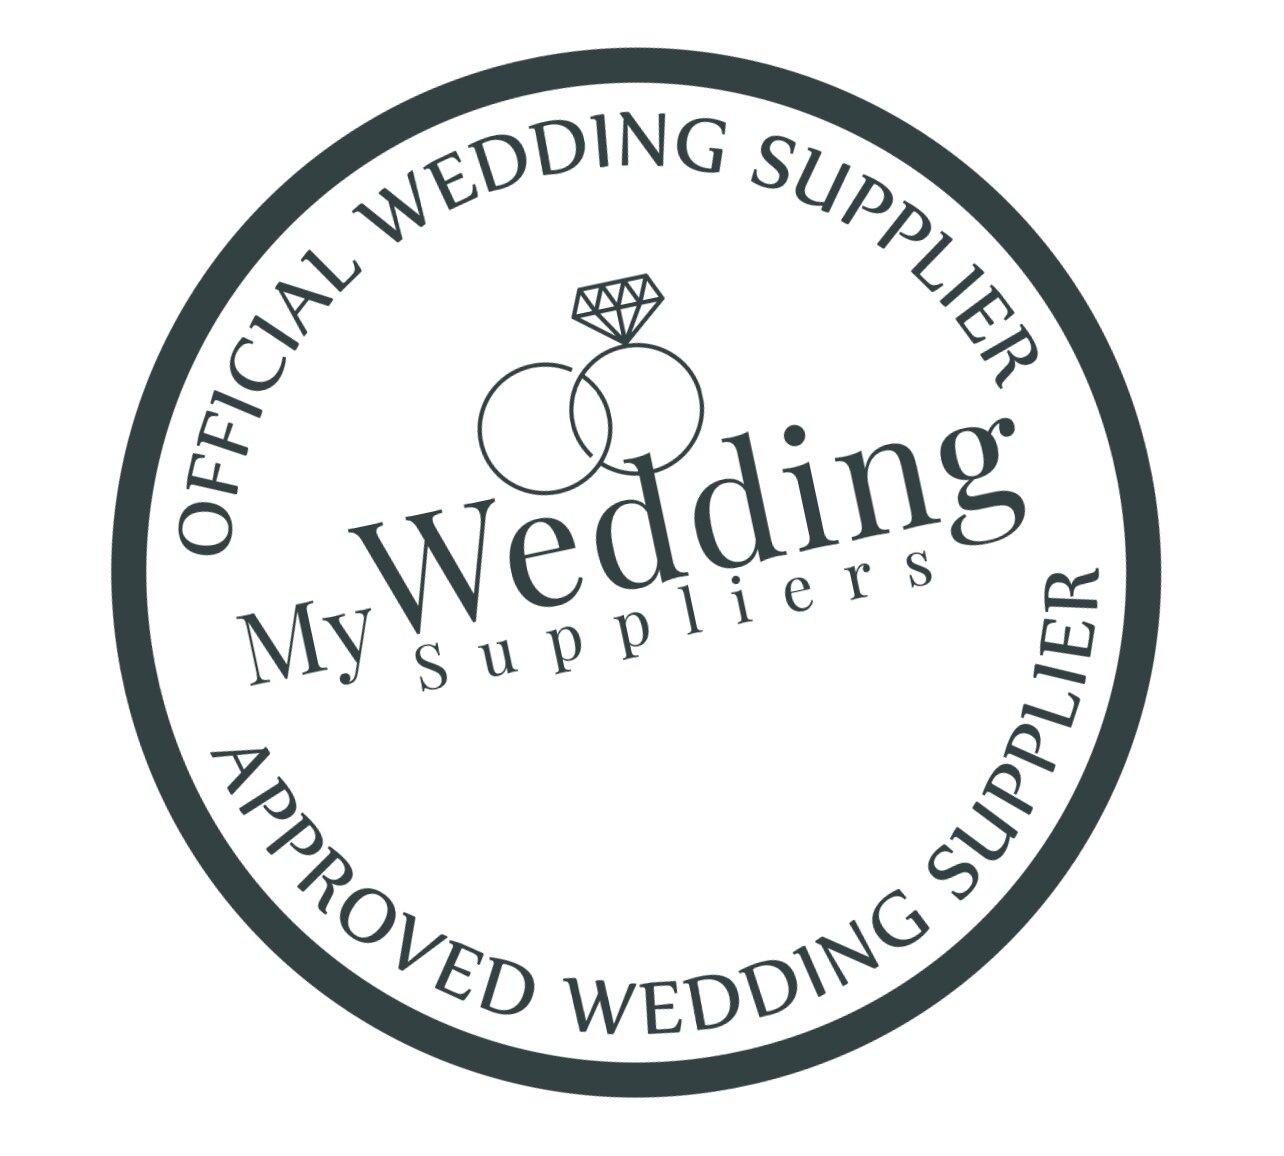 my-wedding-suppliers-3.jpg